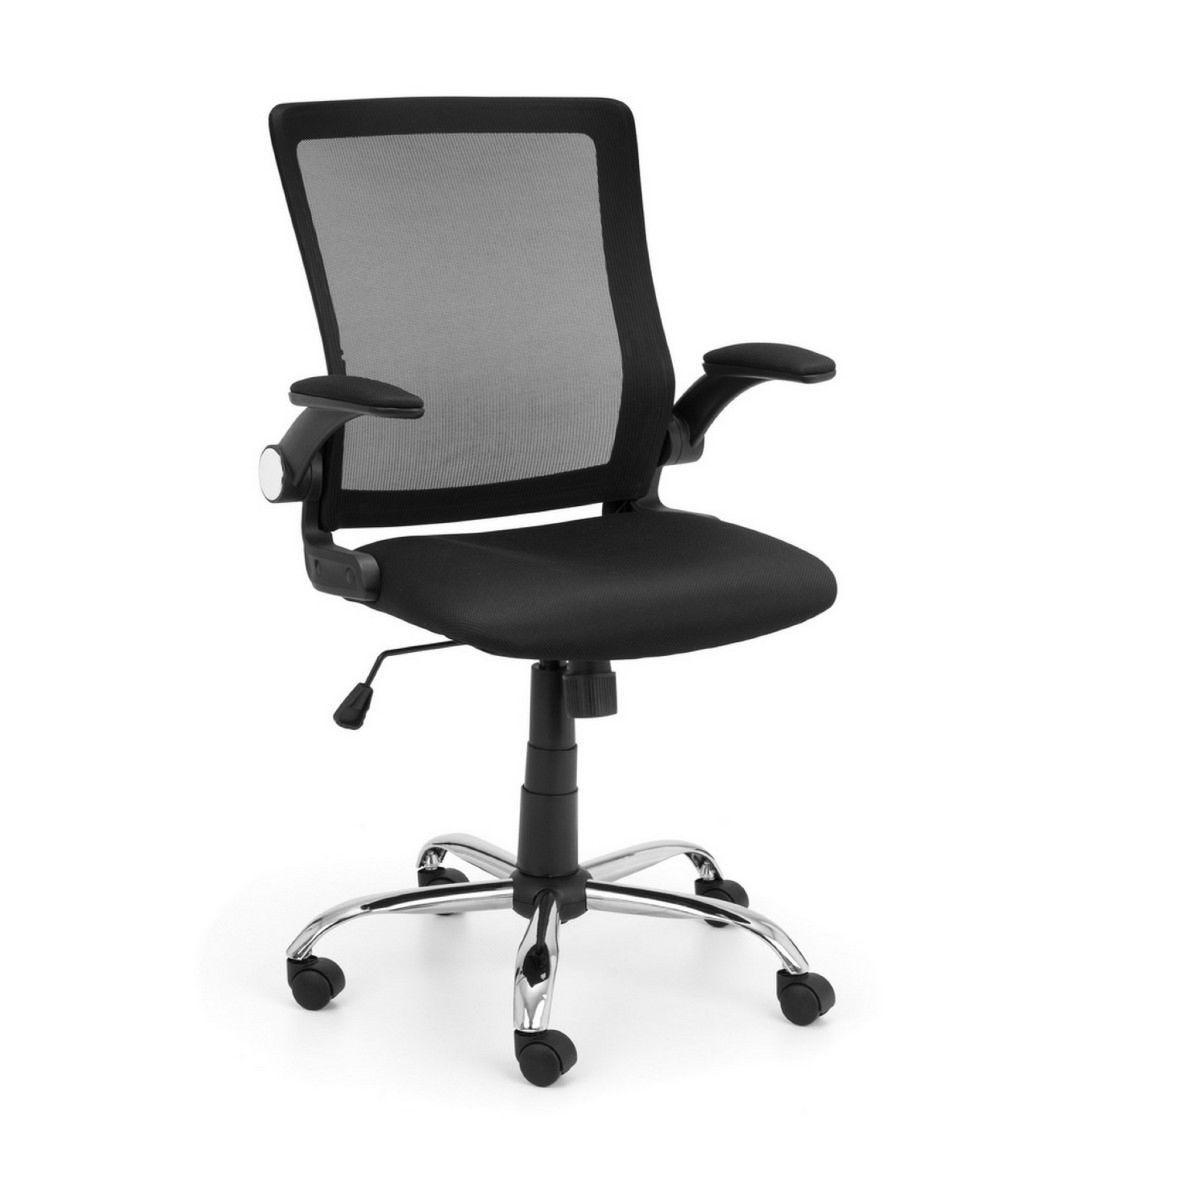 Julian Bowen Imola Office Chair